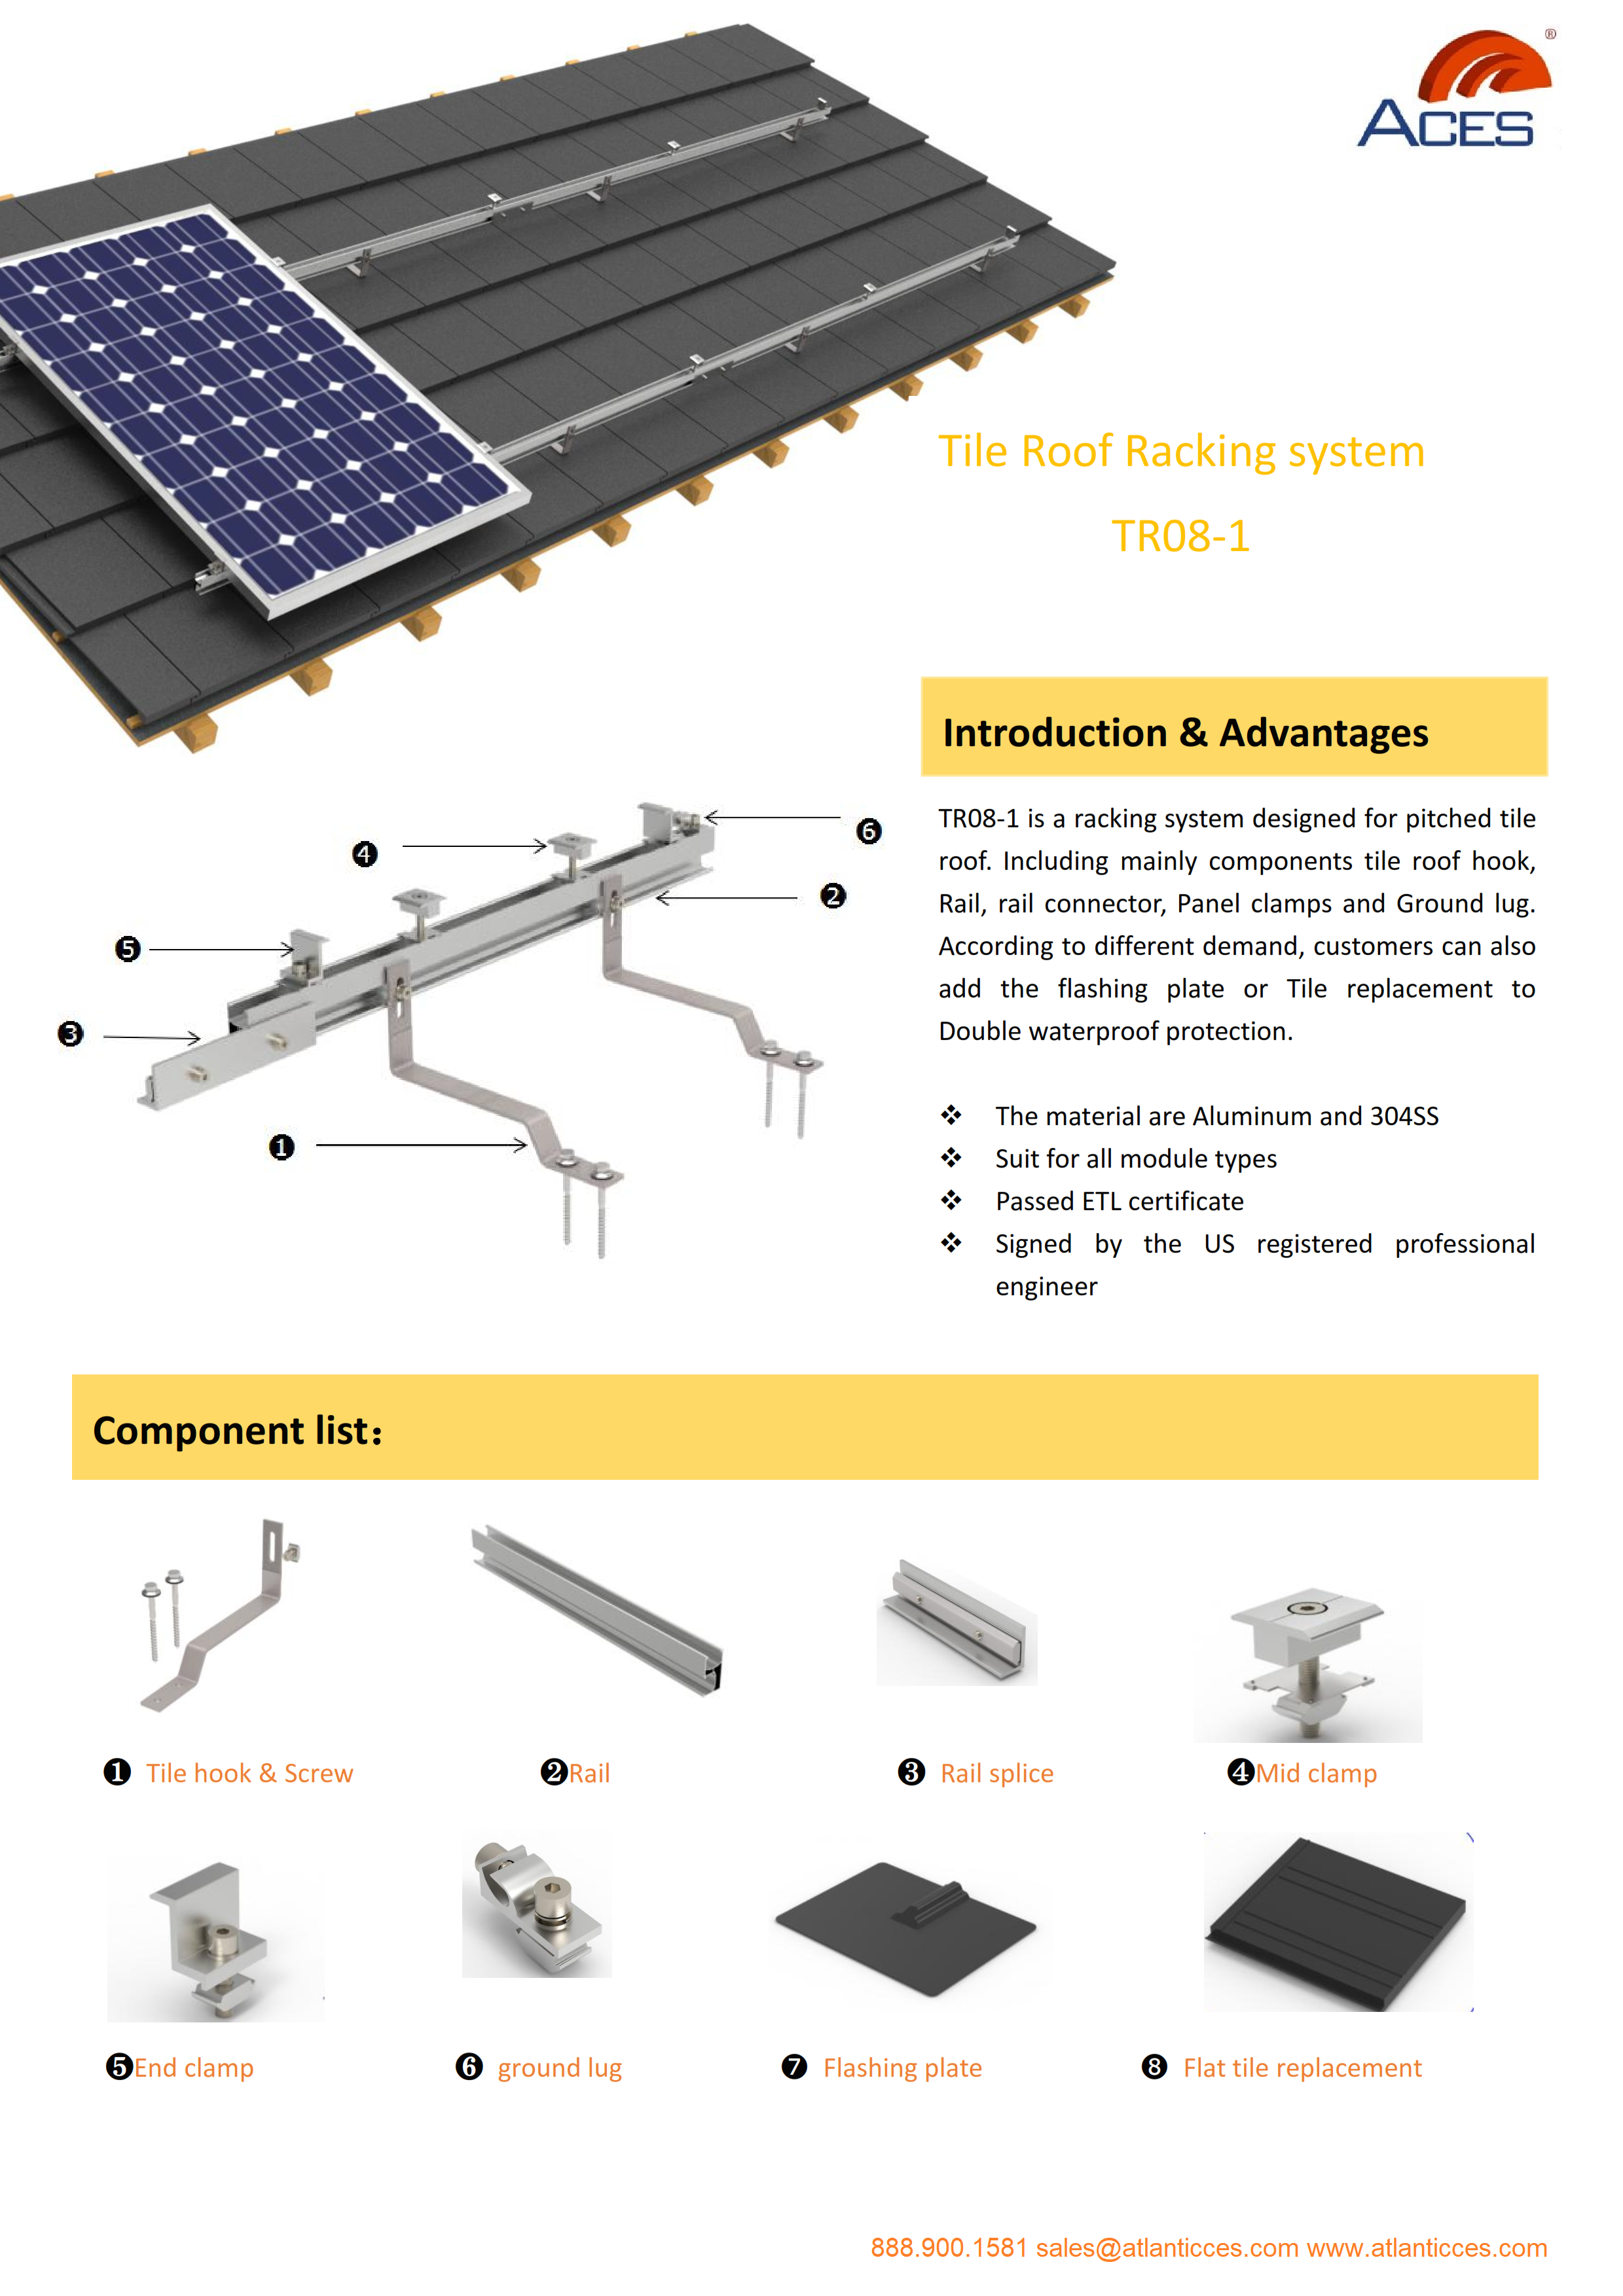 Flat tile roof racking TR08-1